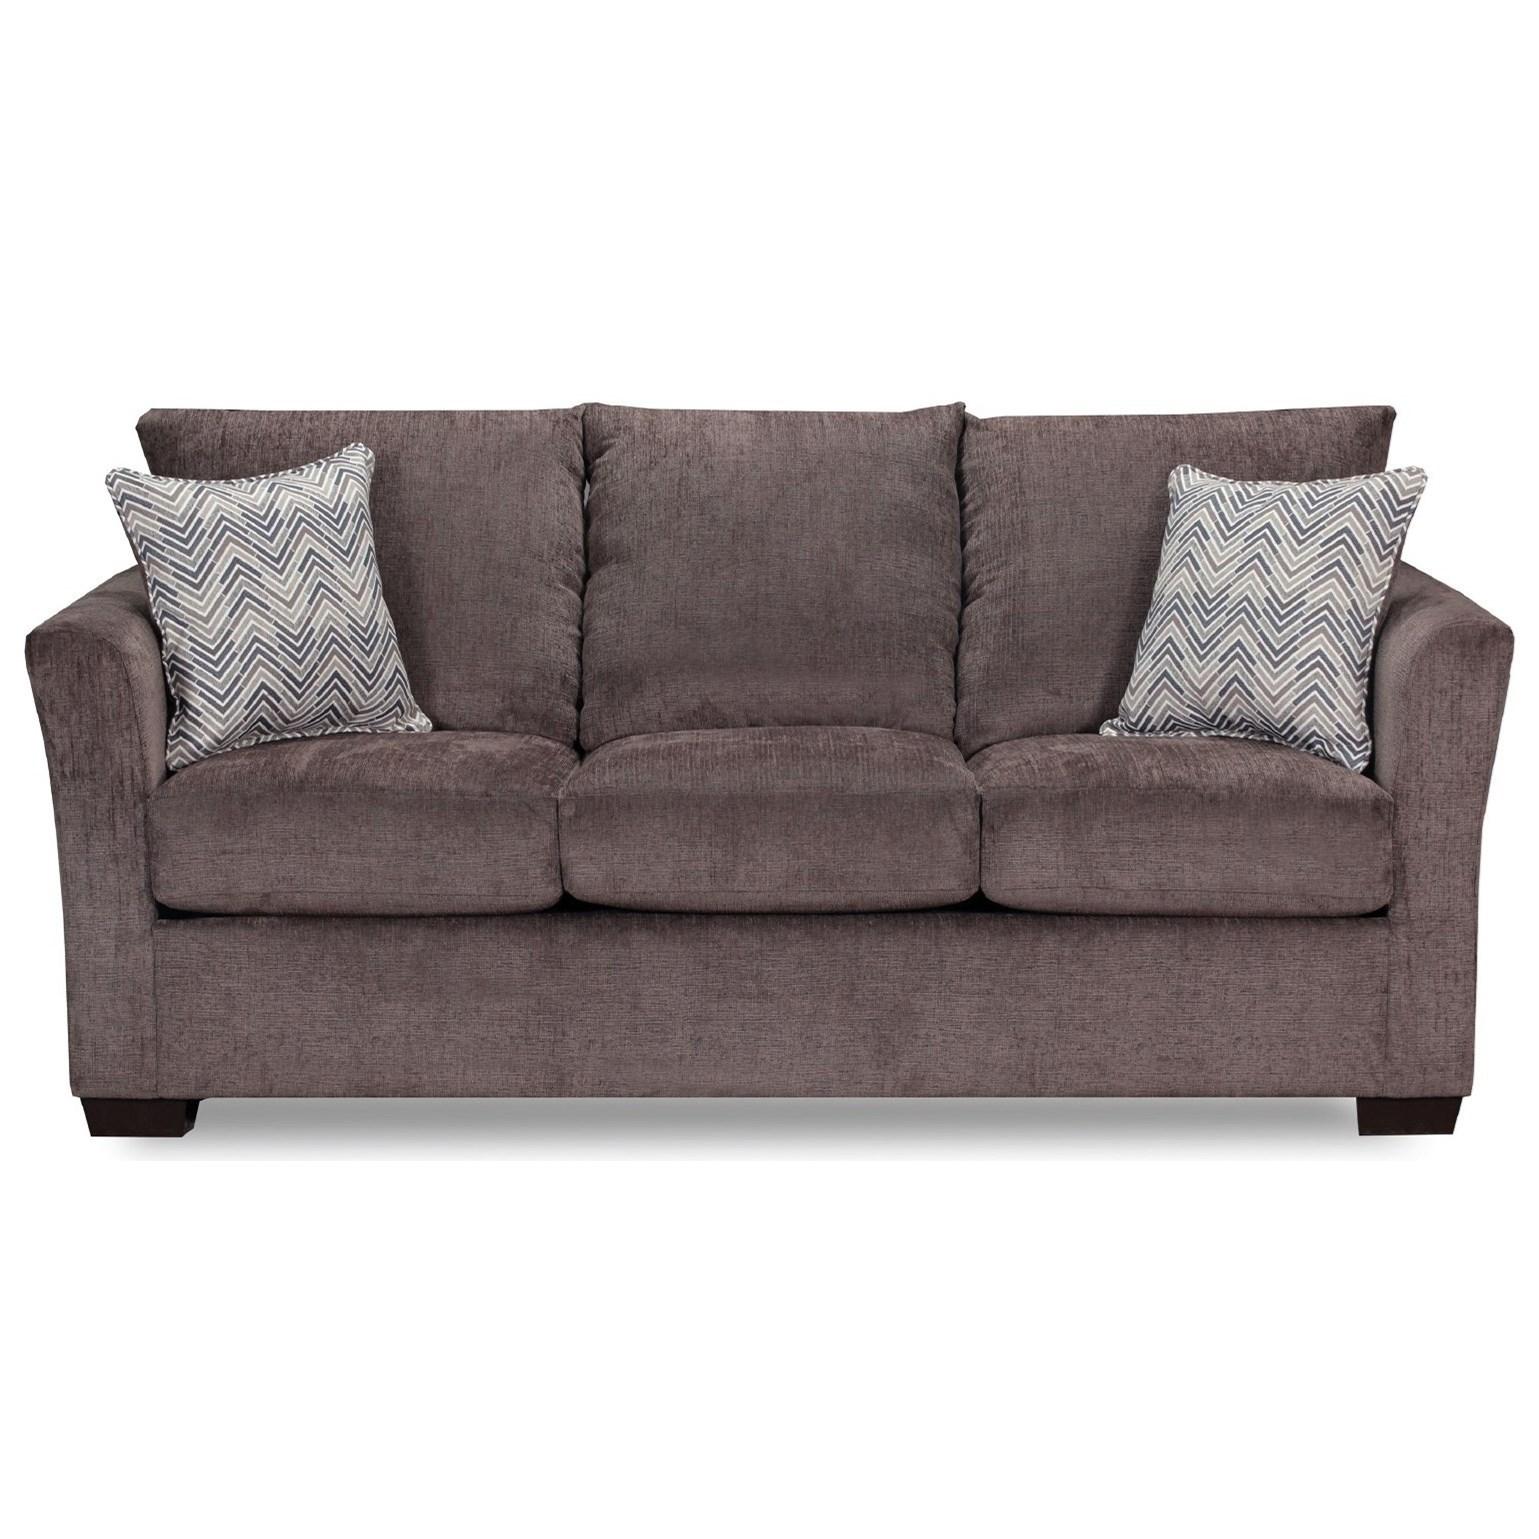 4206 Transitional Queen Sleeper Sofa by United Furniture Industries at Bullard Furniture